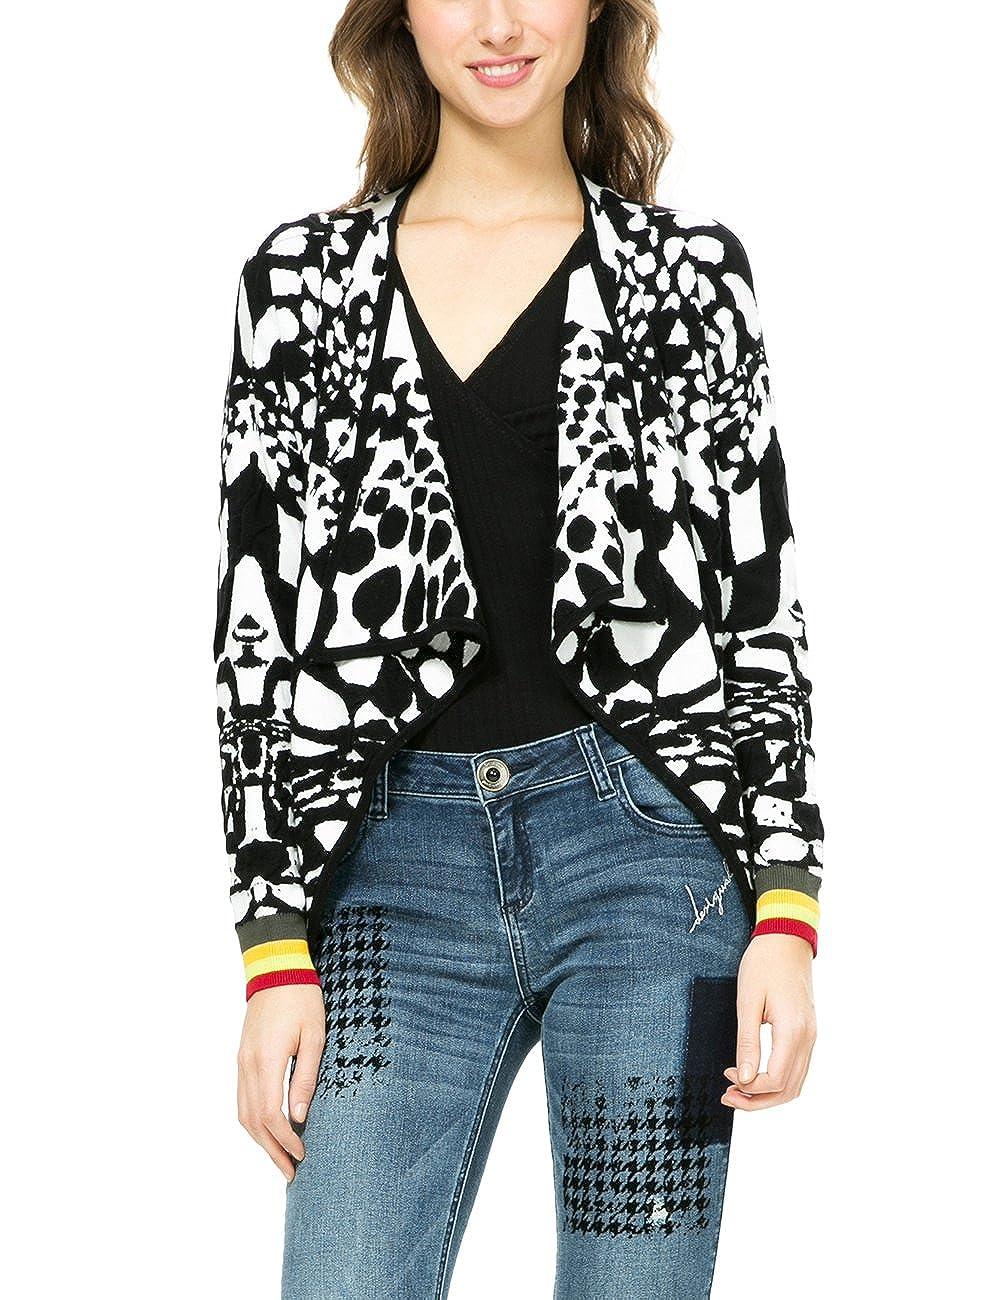 Desigual Jers_vir, suéter para Mujer